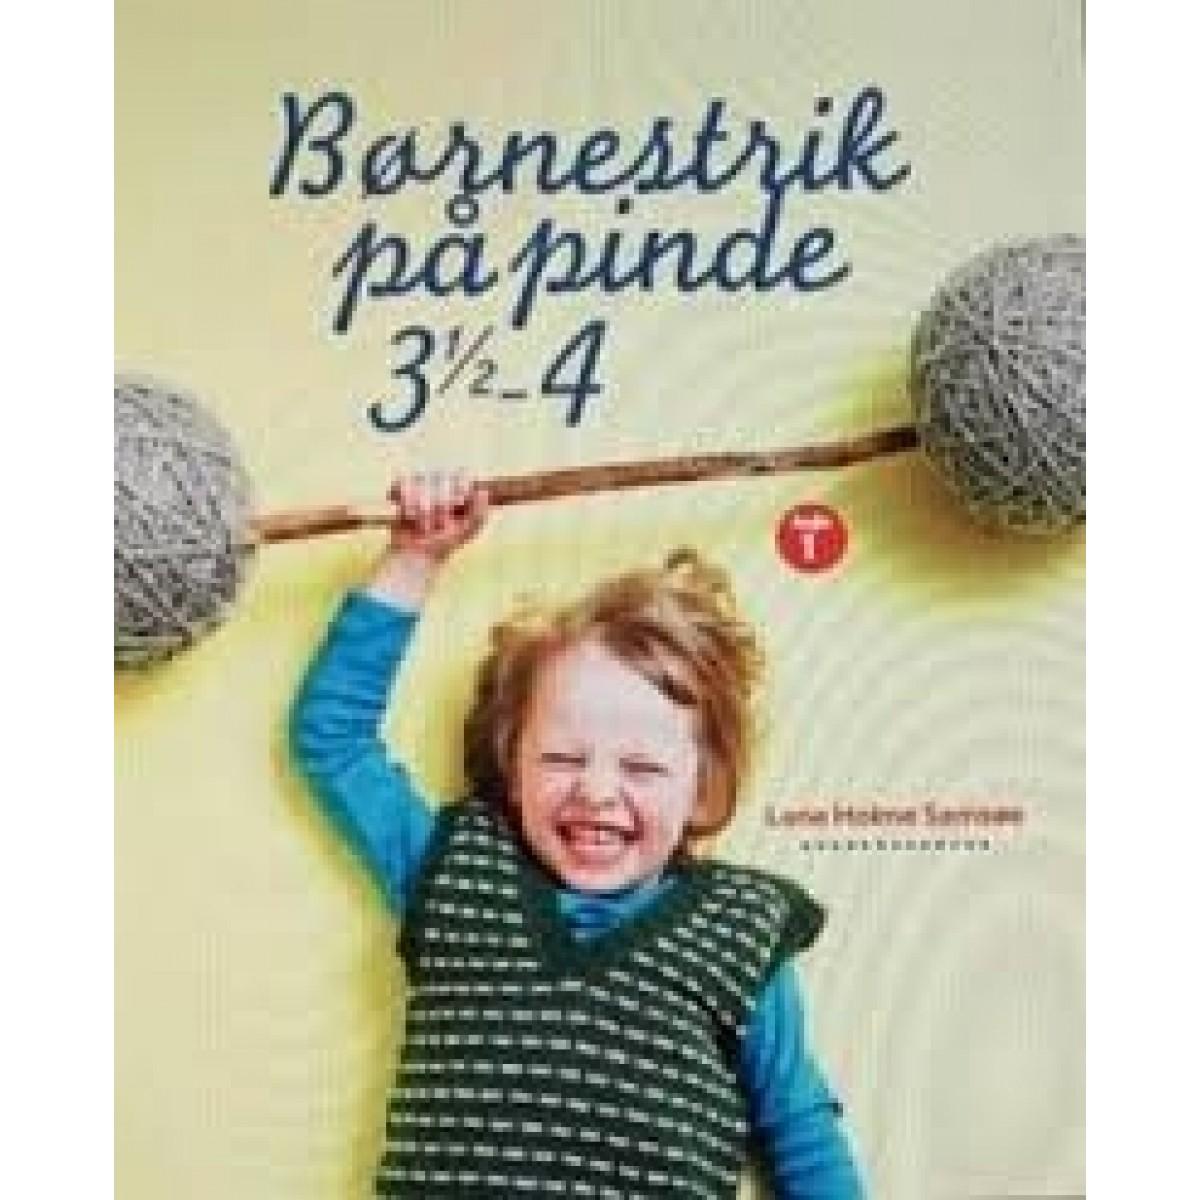 Brnestrikpp34-33